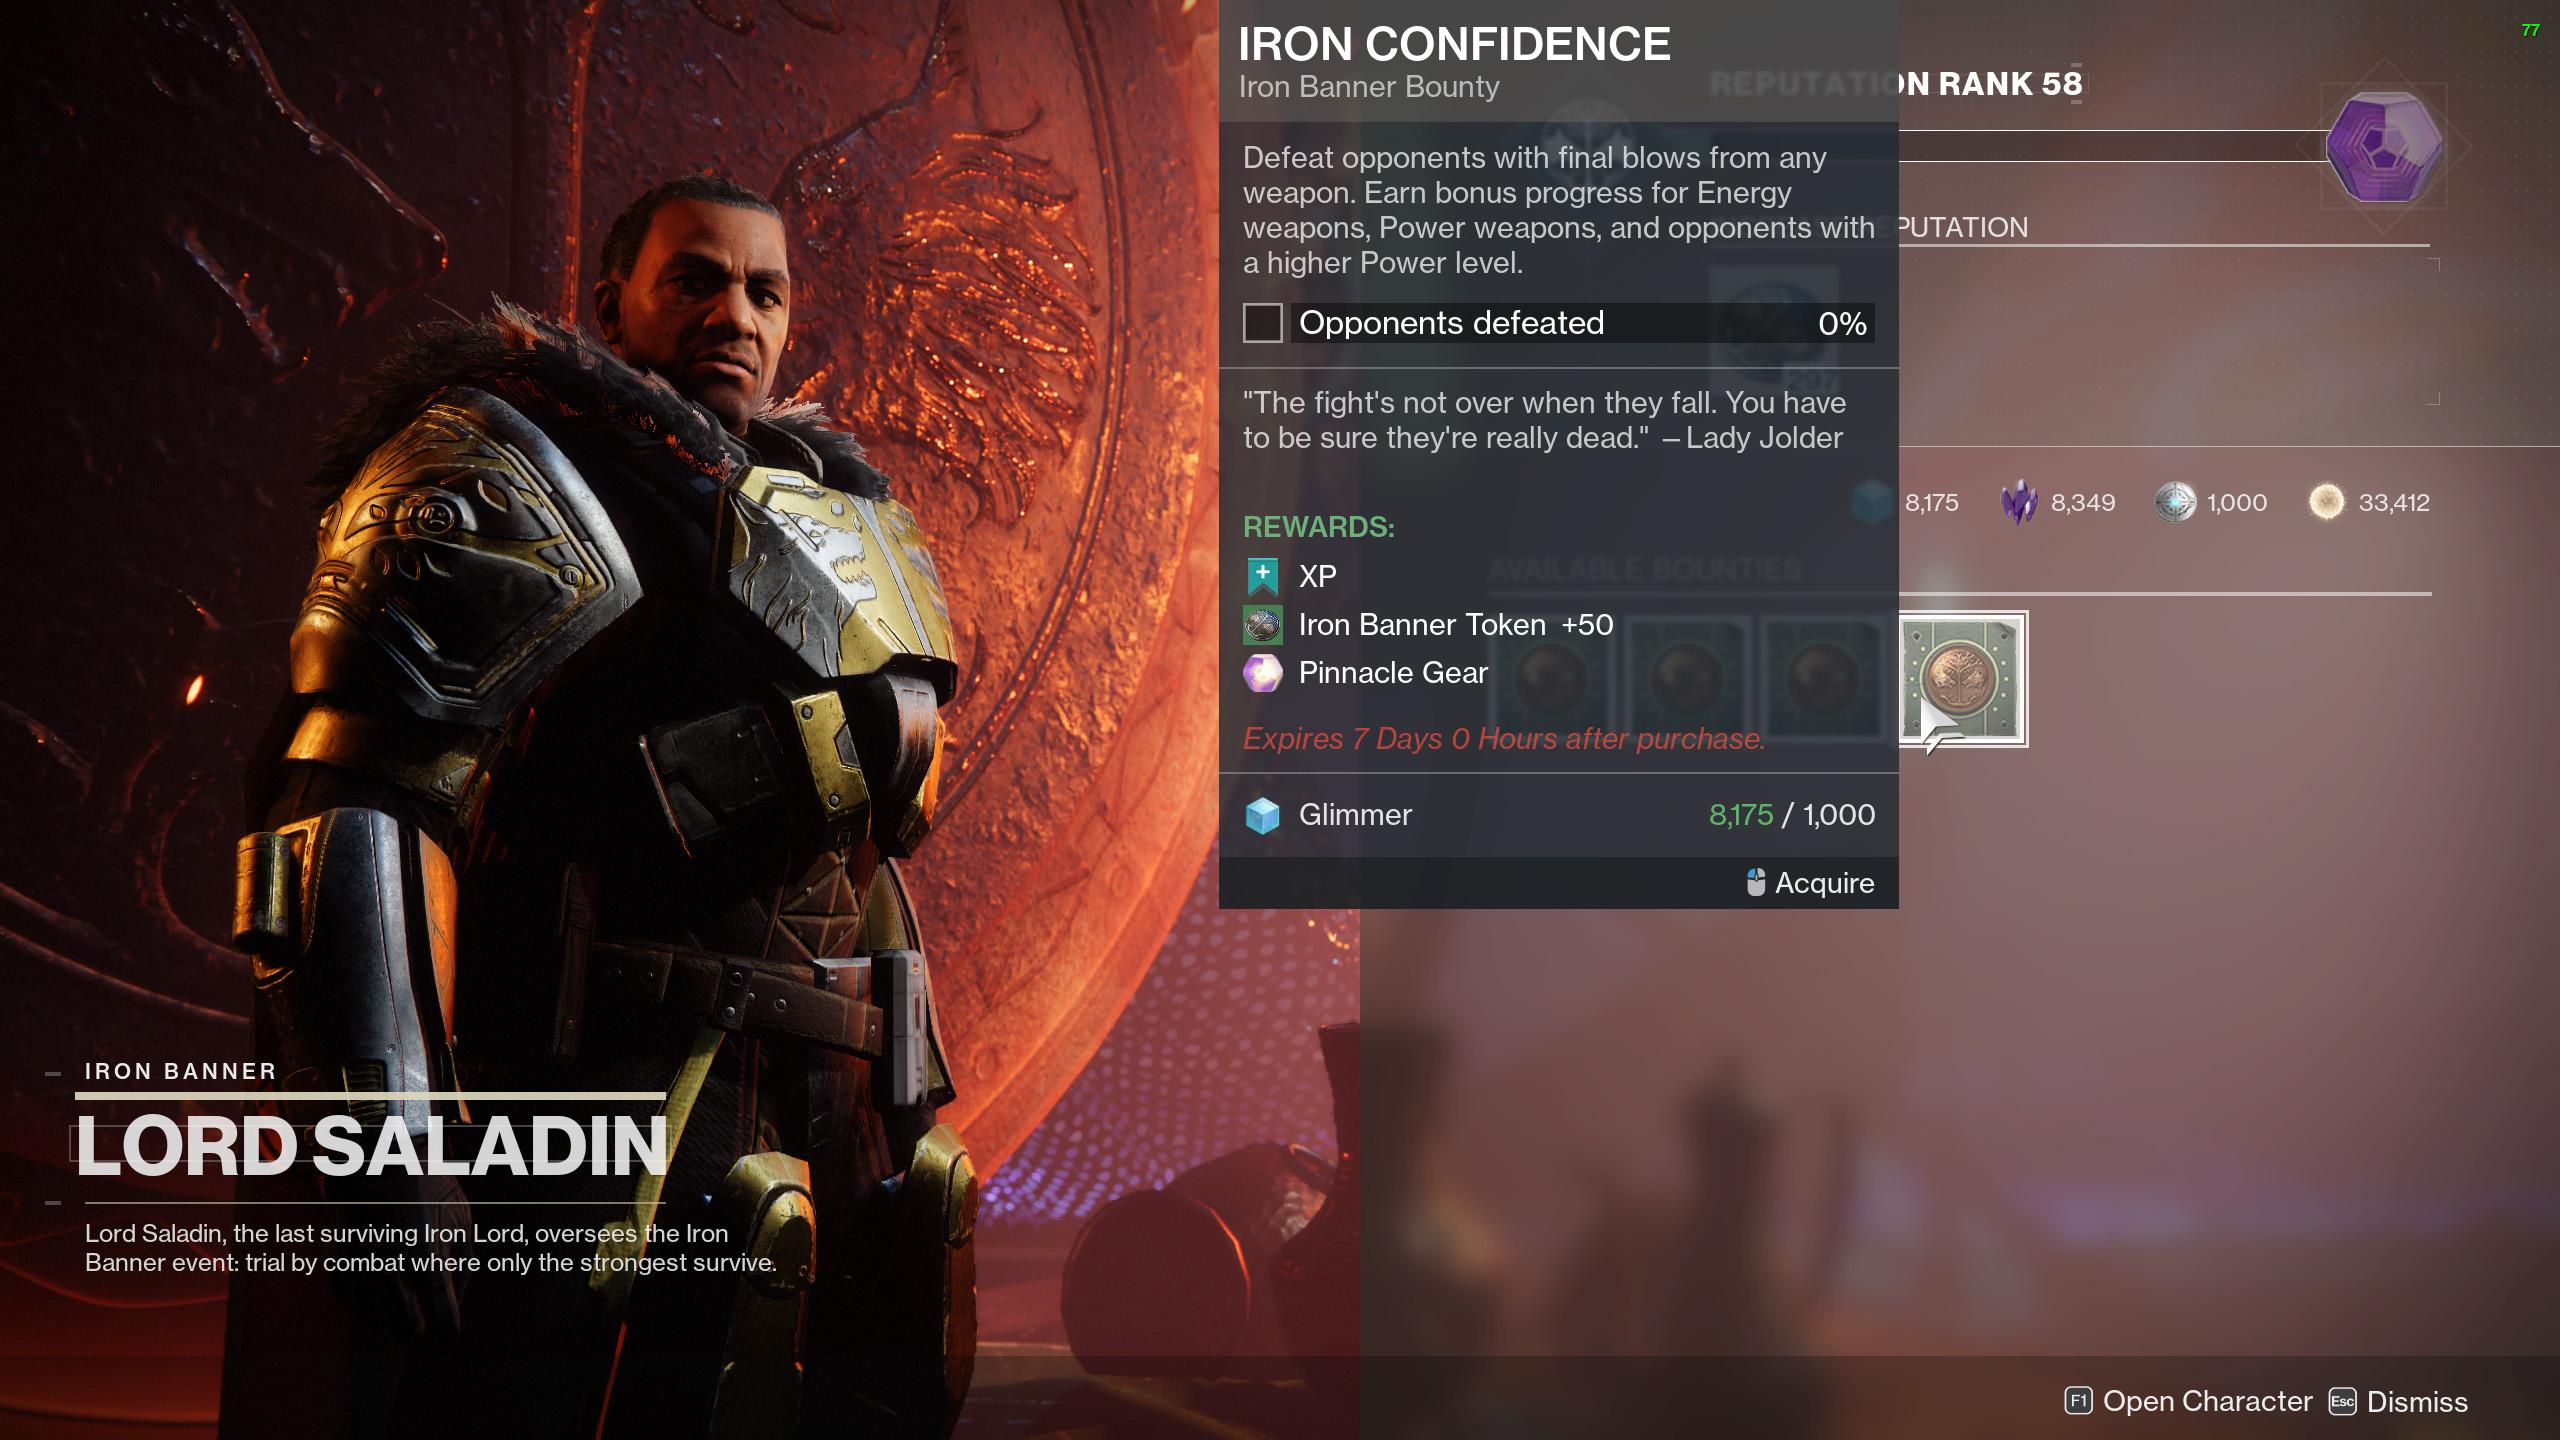 destiny 2 iron banner season 14 bounties iron confidence